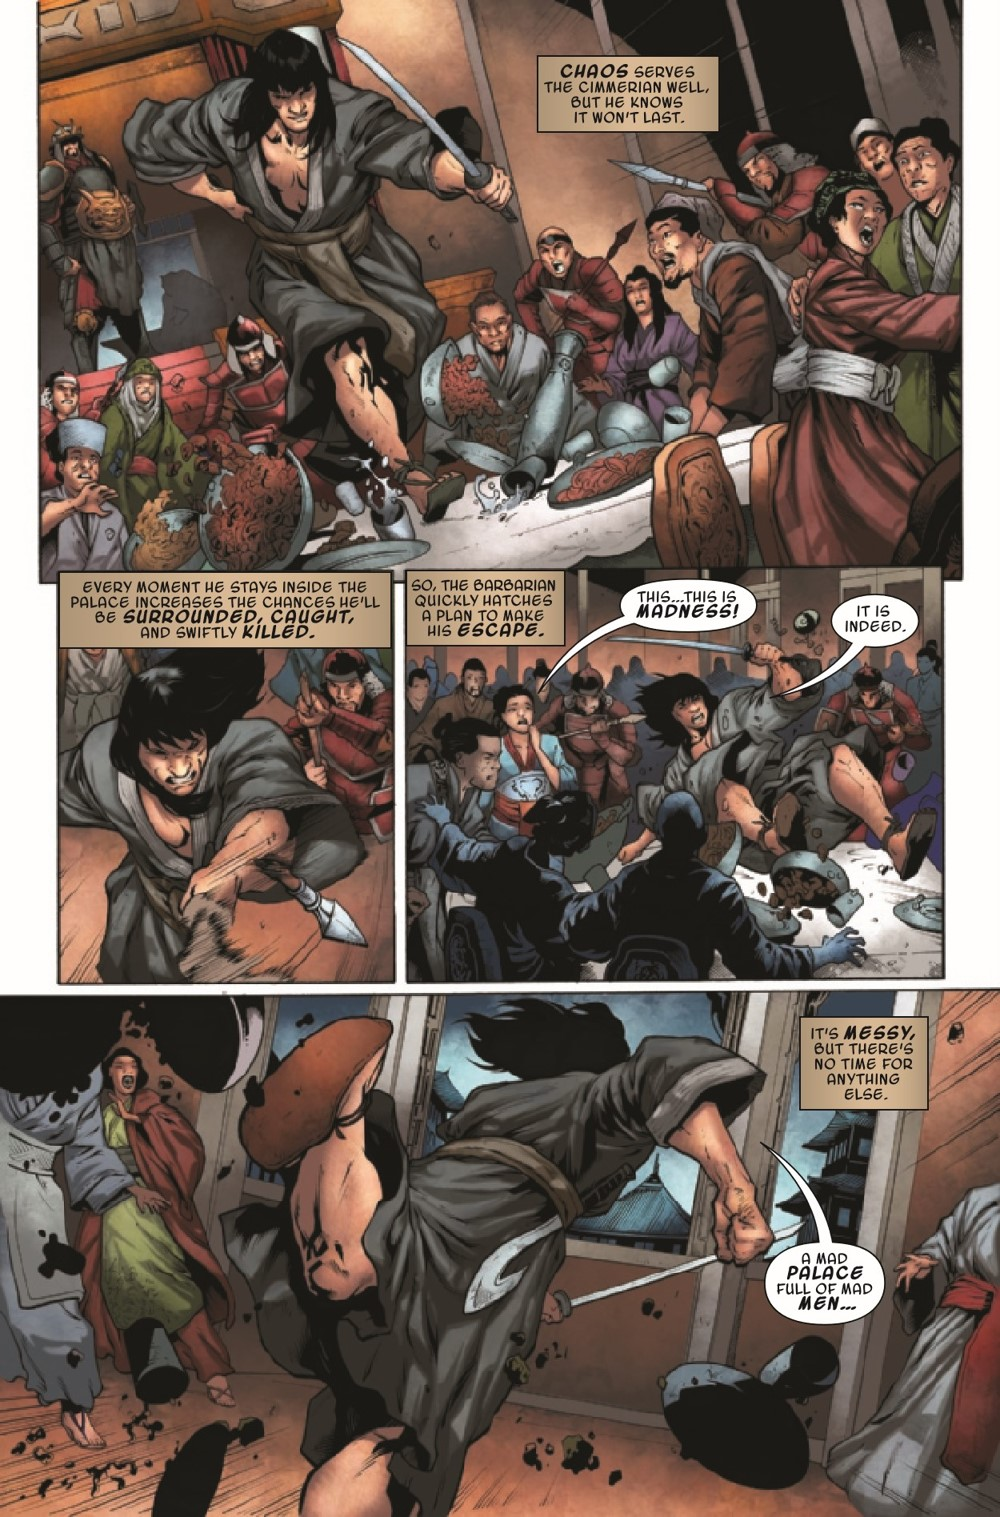 CONANBARB2019023_Preview-4 ComicList Previews: CONAN THE BARBARIAN #23